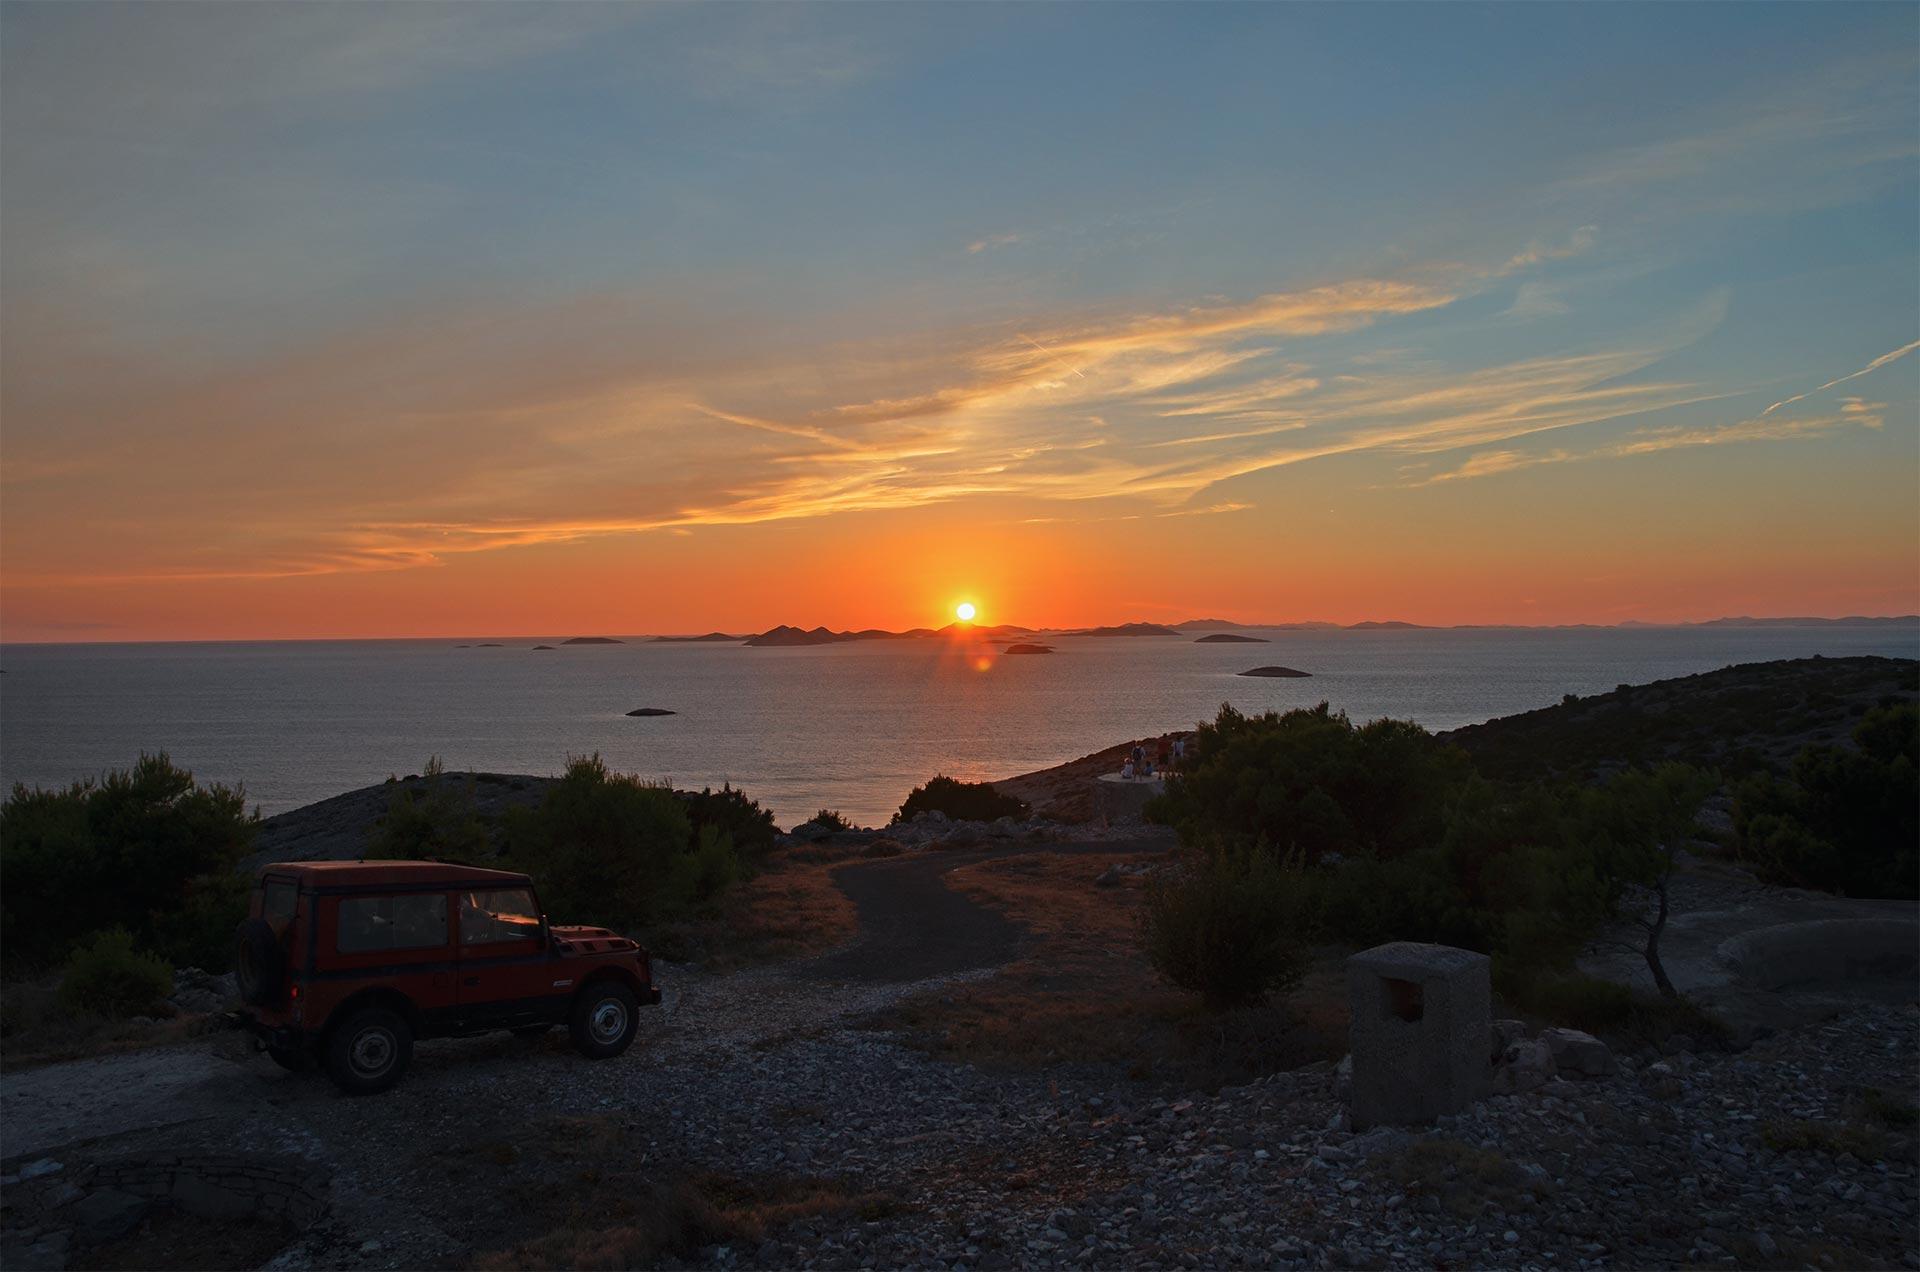 Über uns • Sonnenuntergang am Meer • Reise dich frei